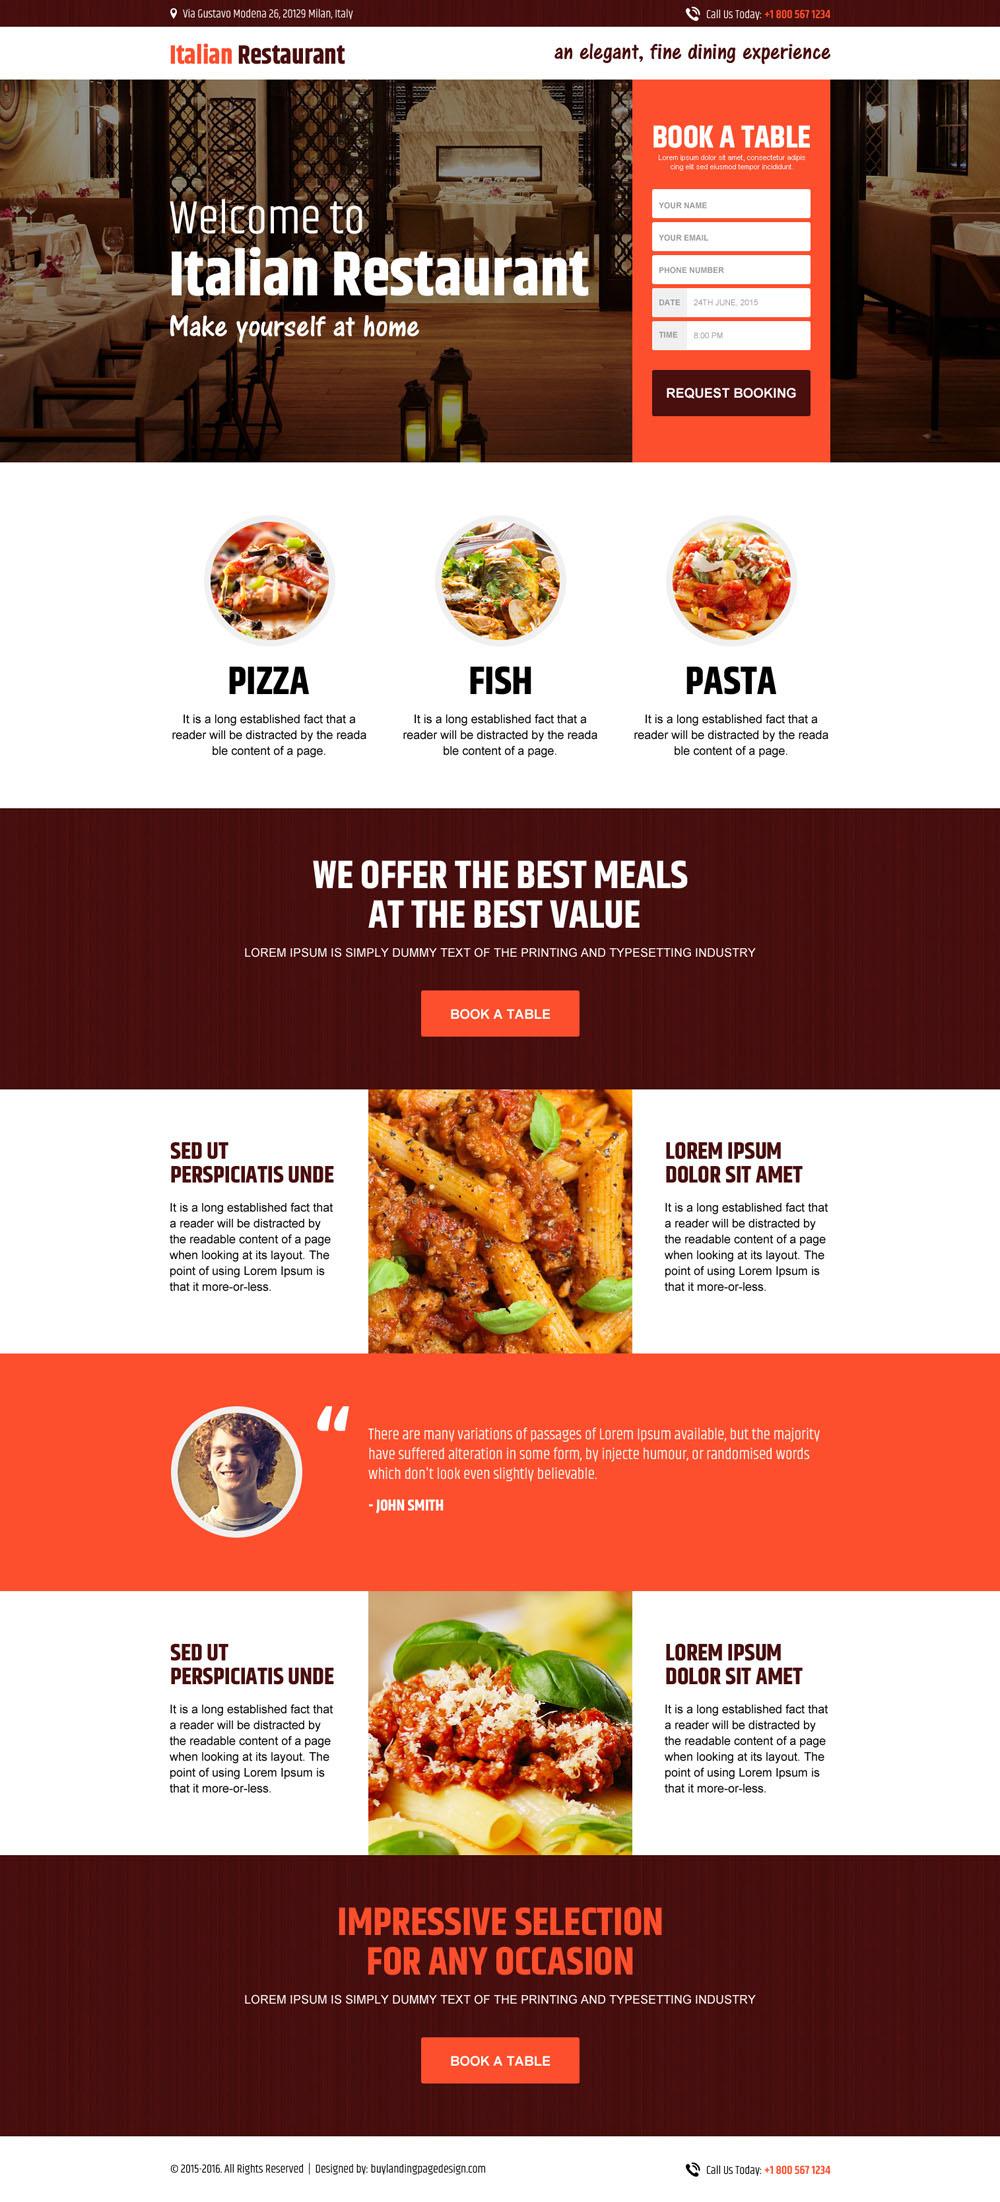 italian-restaurant-lead-capture-converting-landing-page-design-001